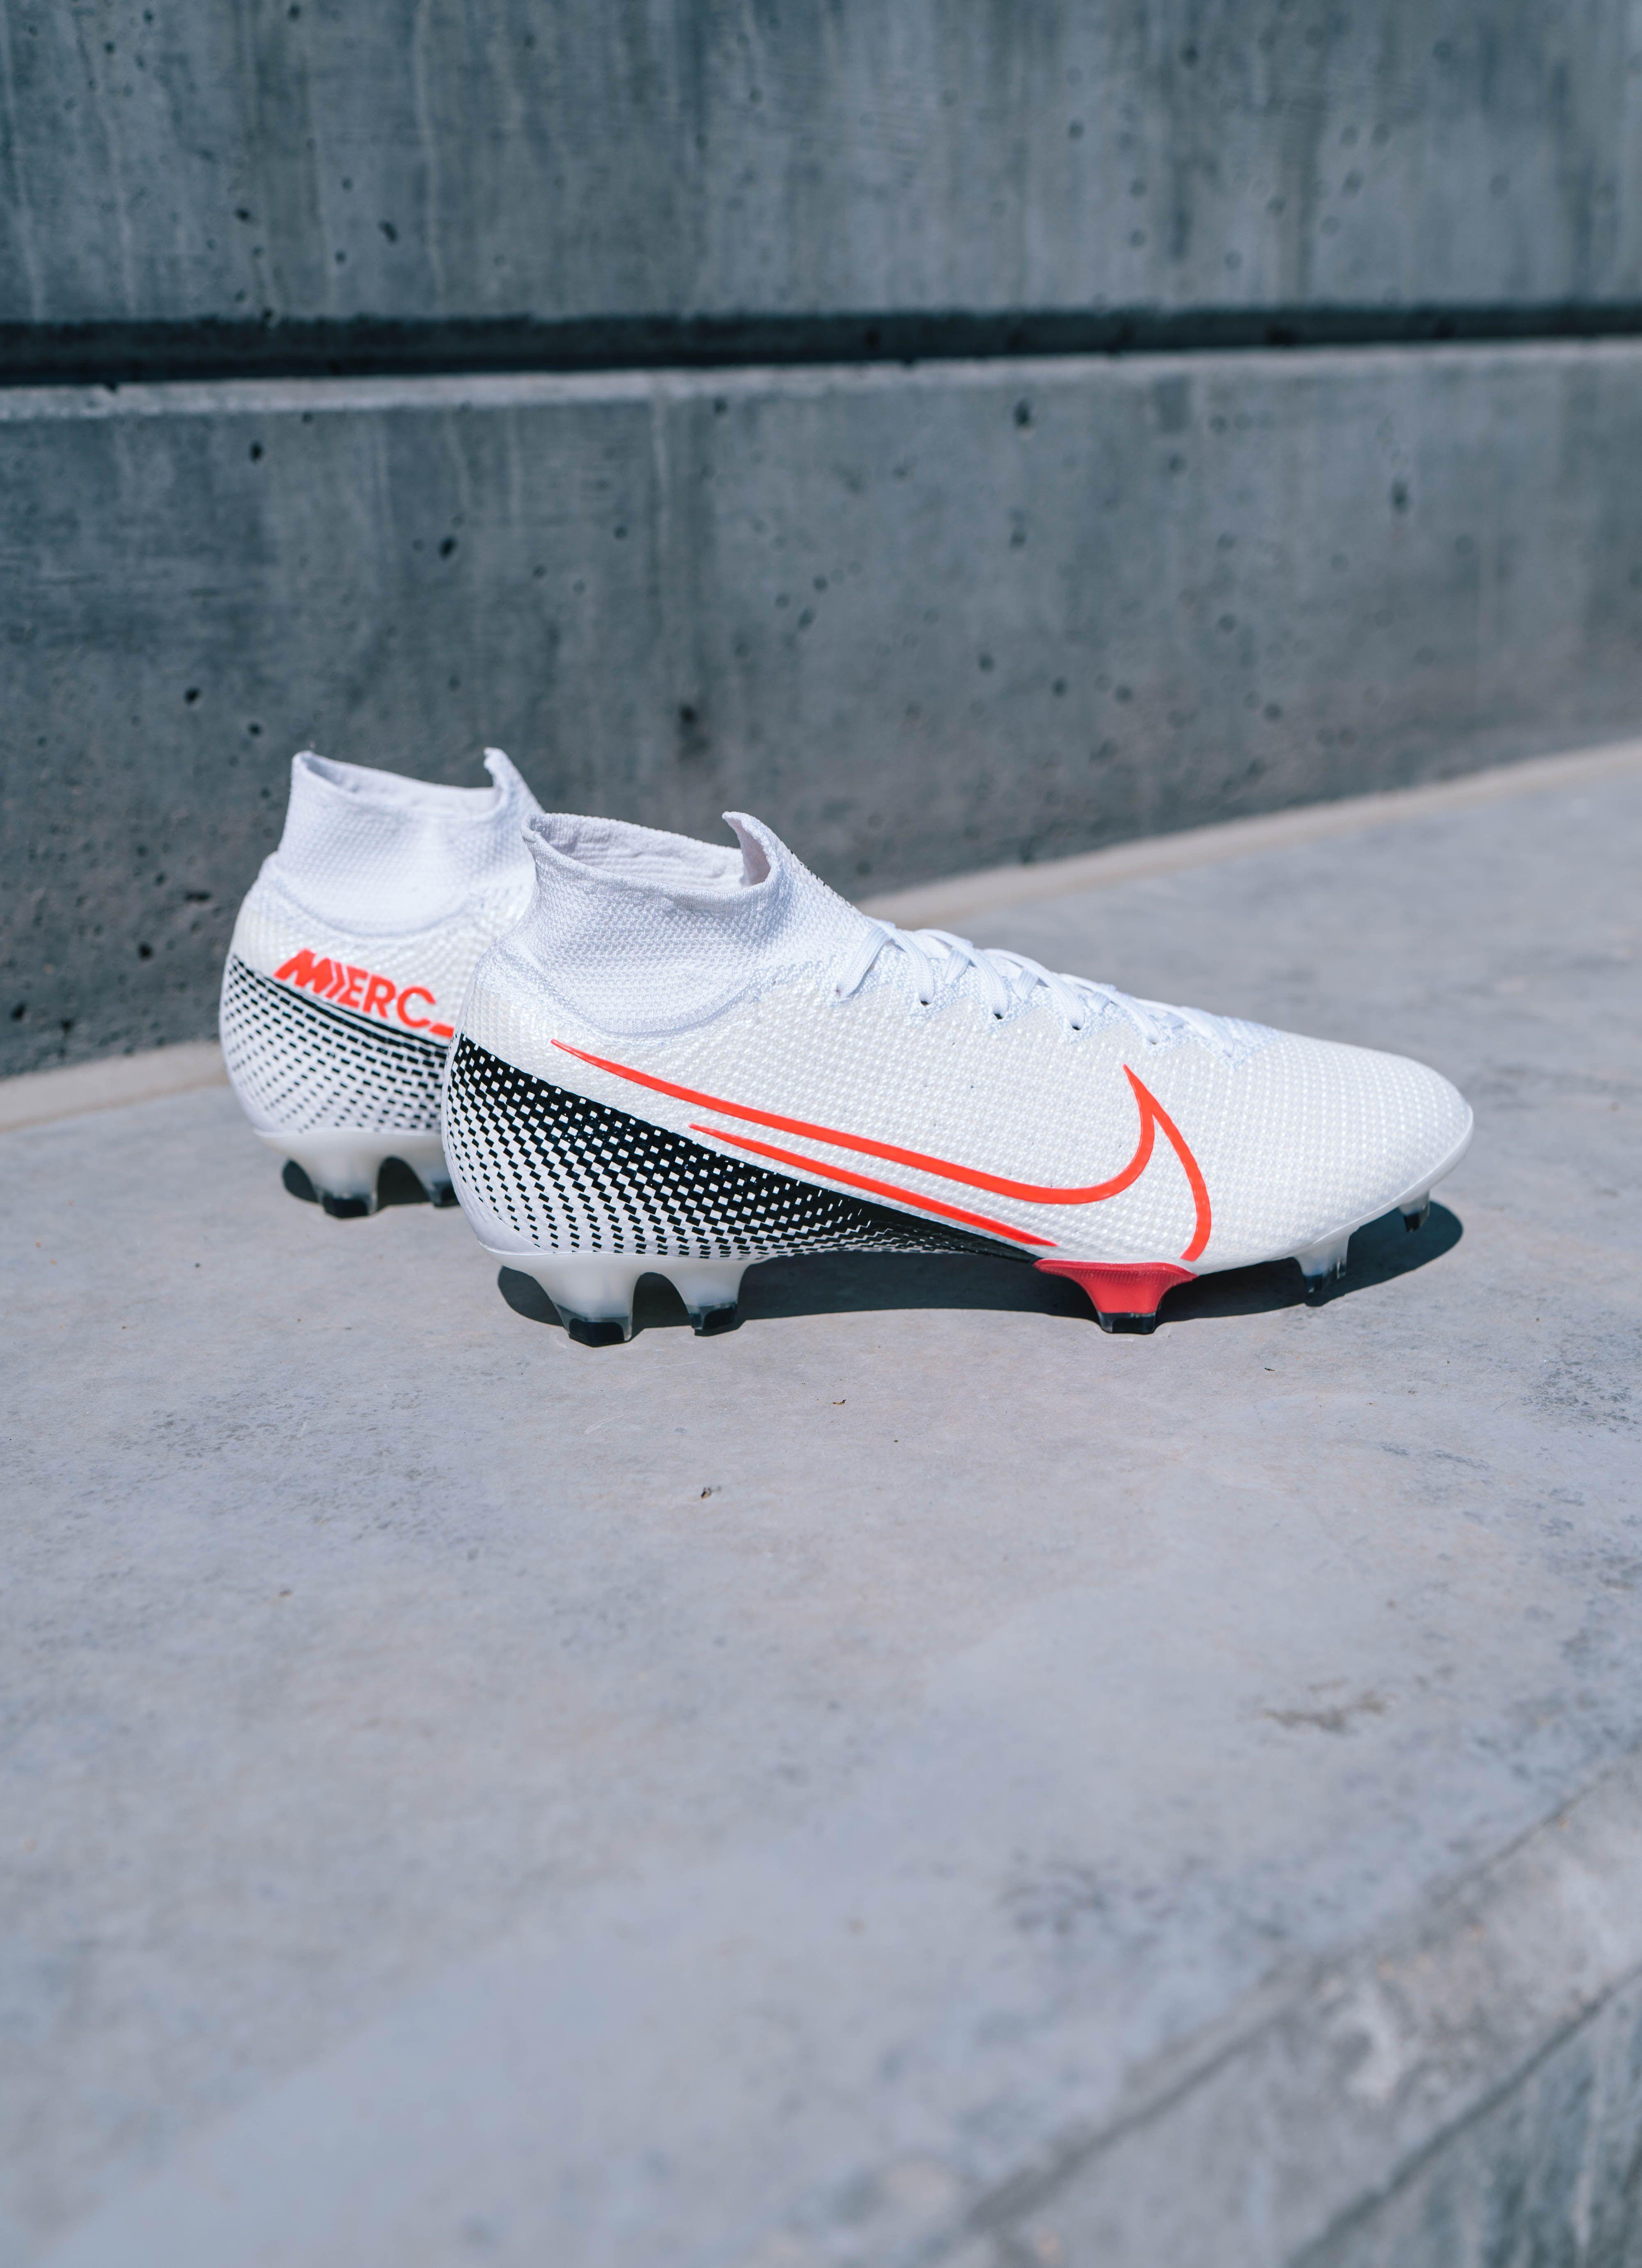 Nike Future Lab Ii Mercurial Superfly 7 Elite Fg Soccer Cleat White Laser Crimson Black In 2020 Girls Soccer Cleats Nike Football Boots Soccer Cleats Adidas